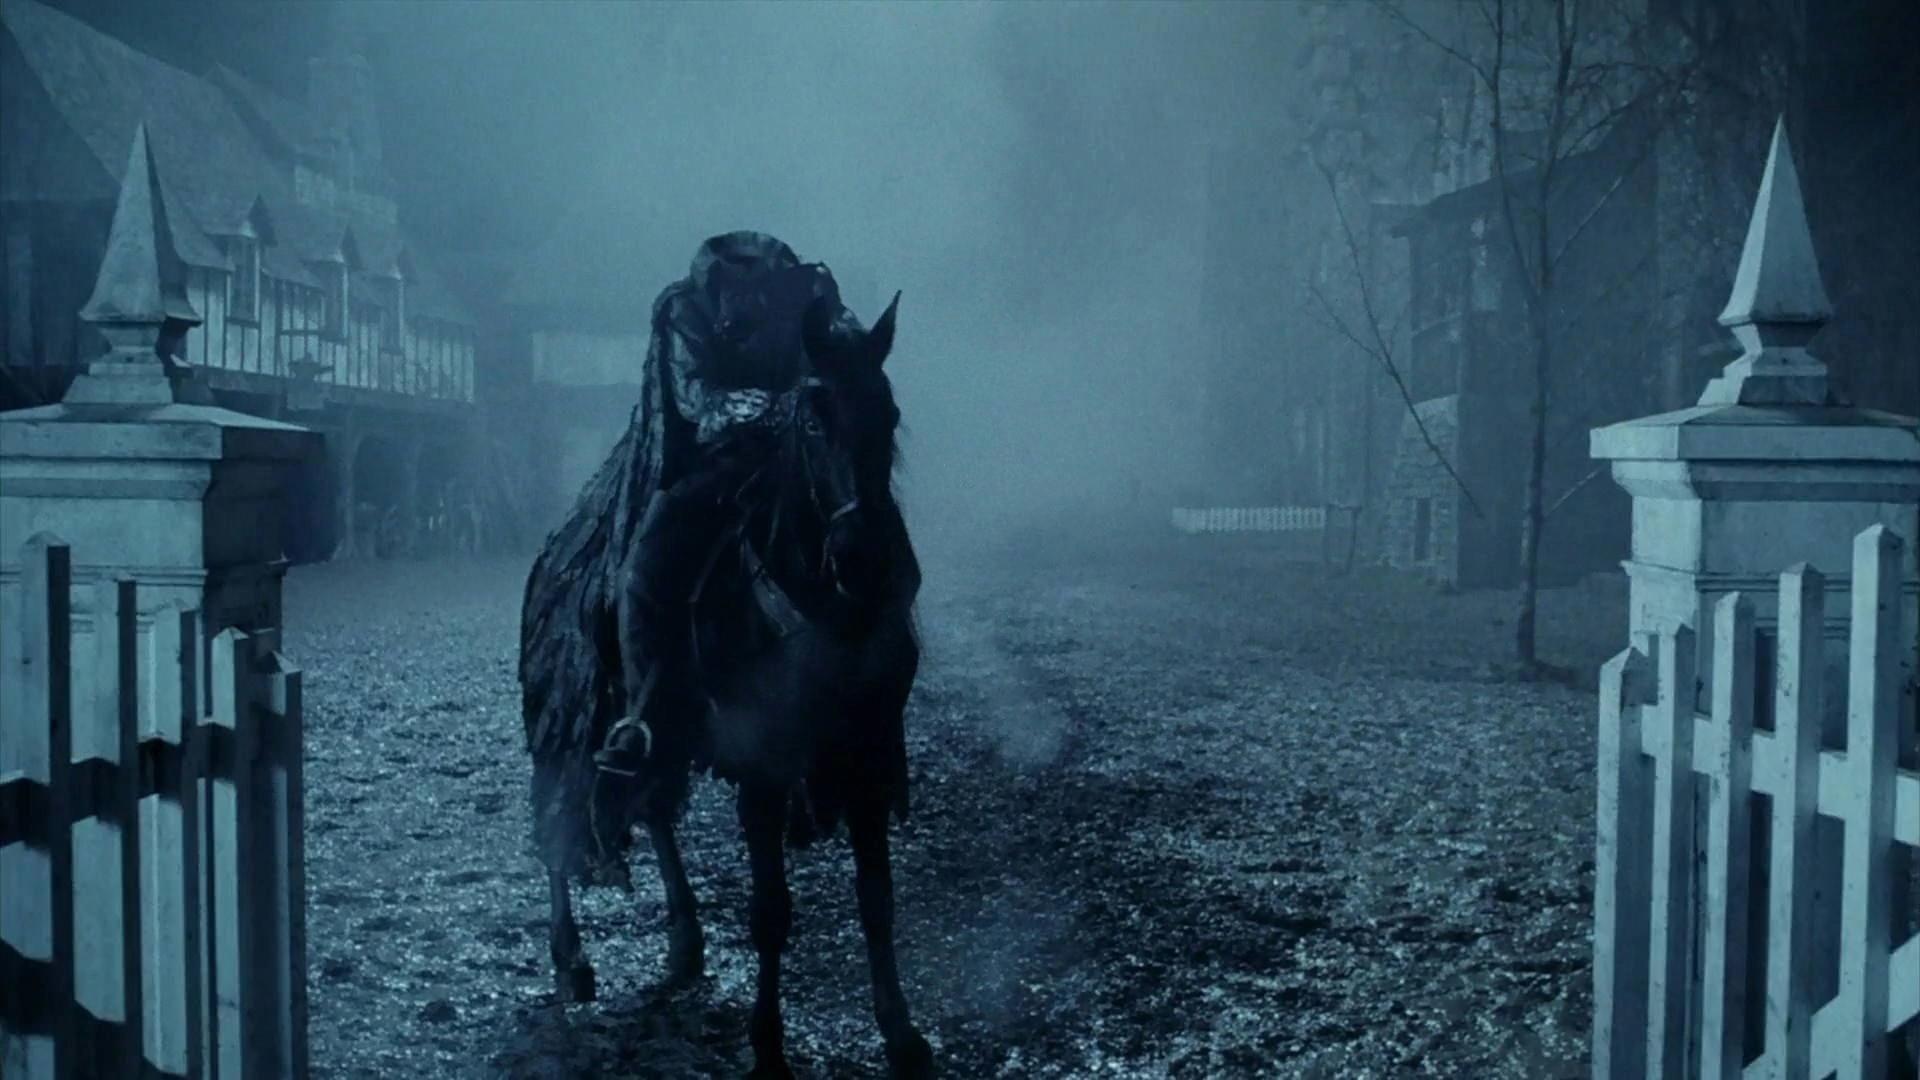 Episode 581 Word Power The Headless Horseman of Sleepy Hollow